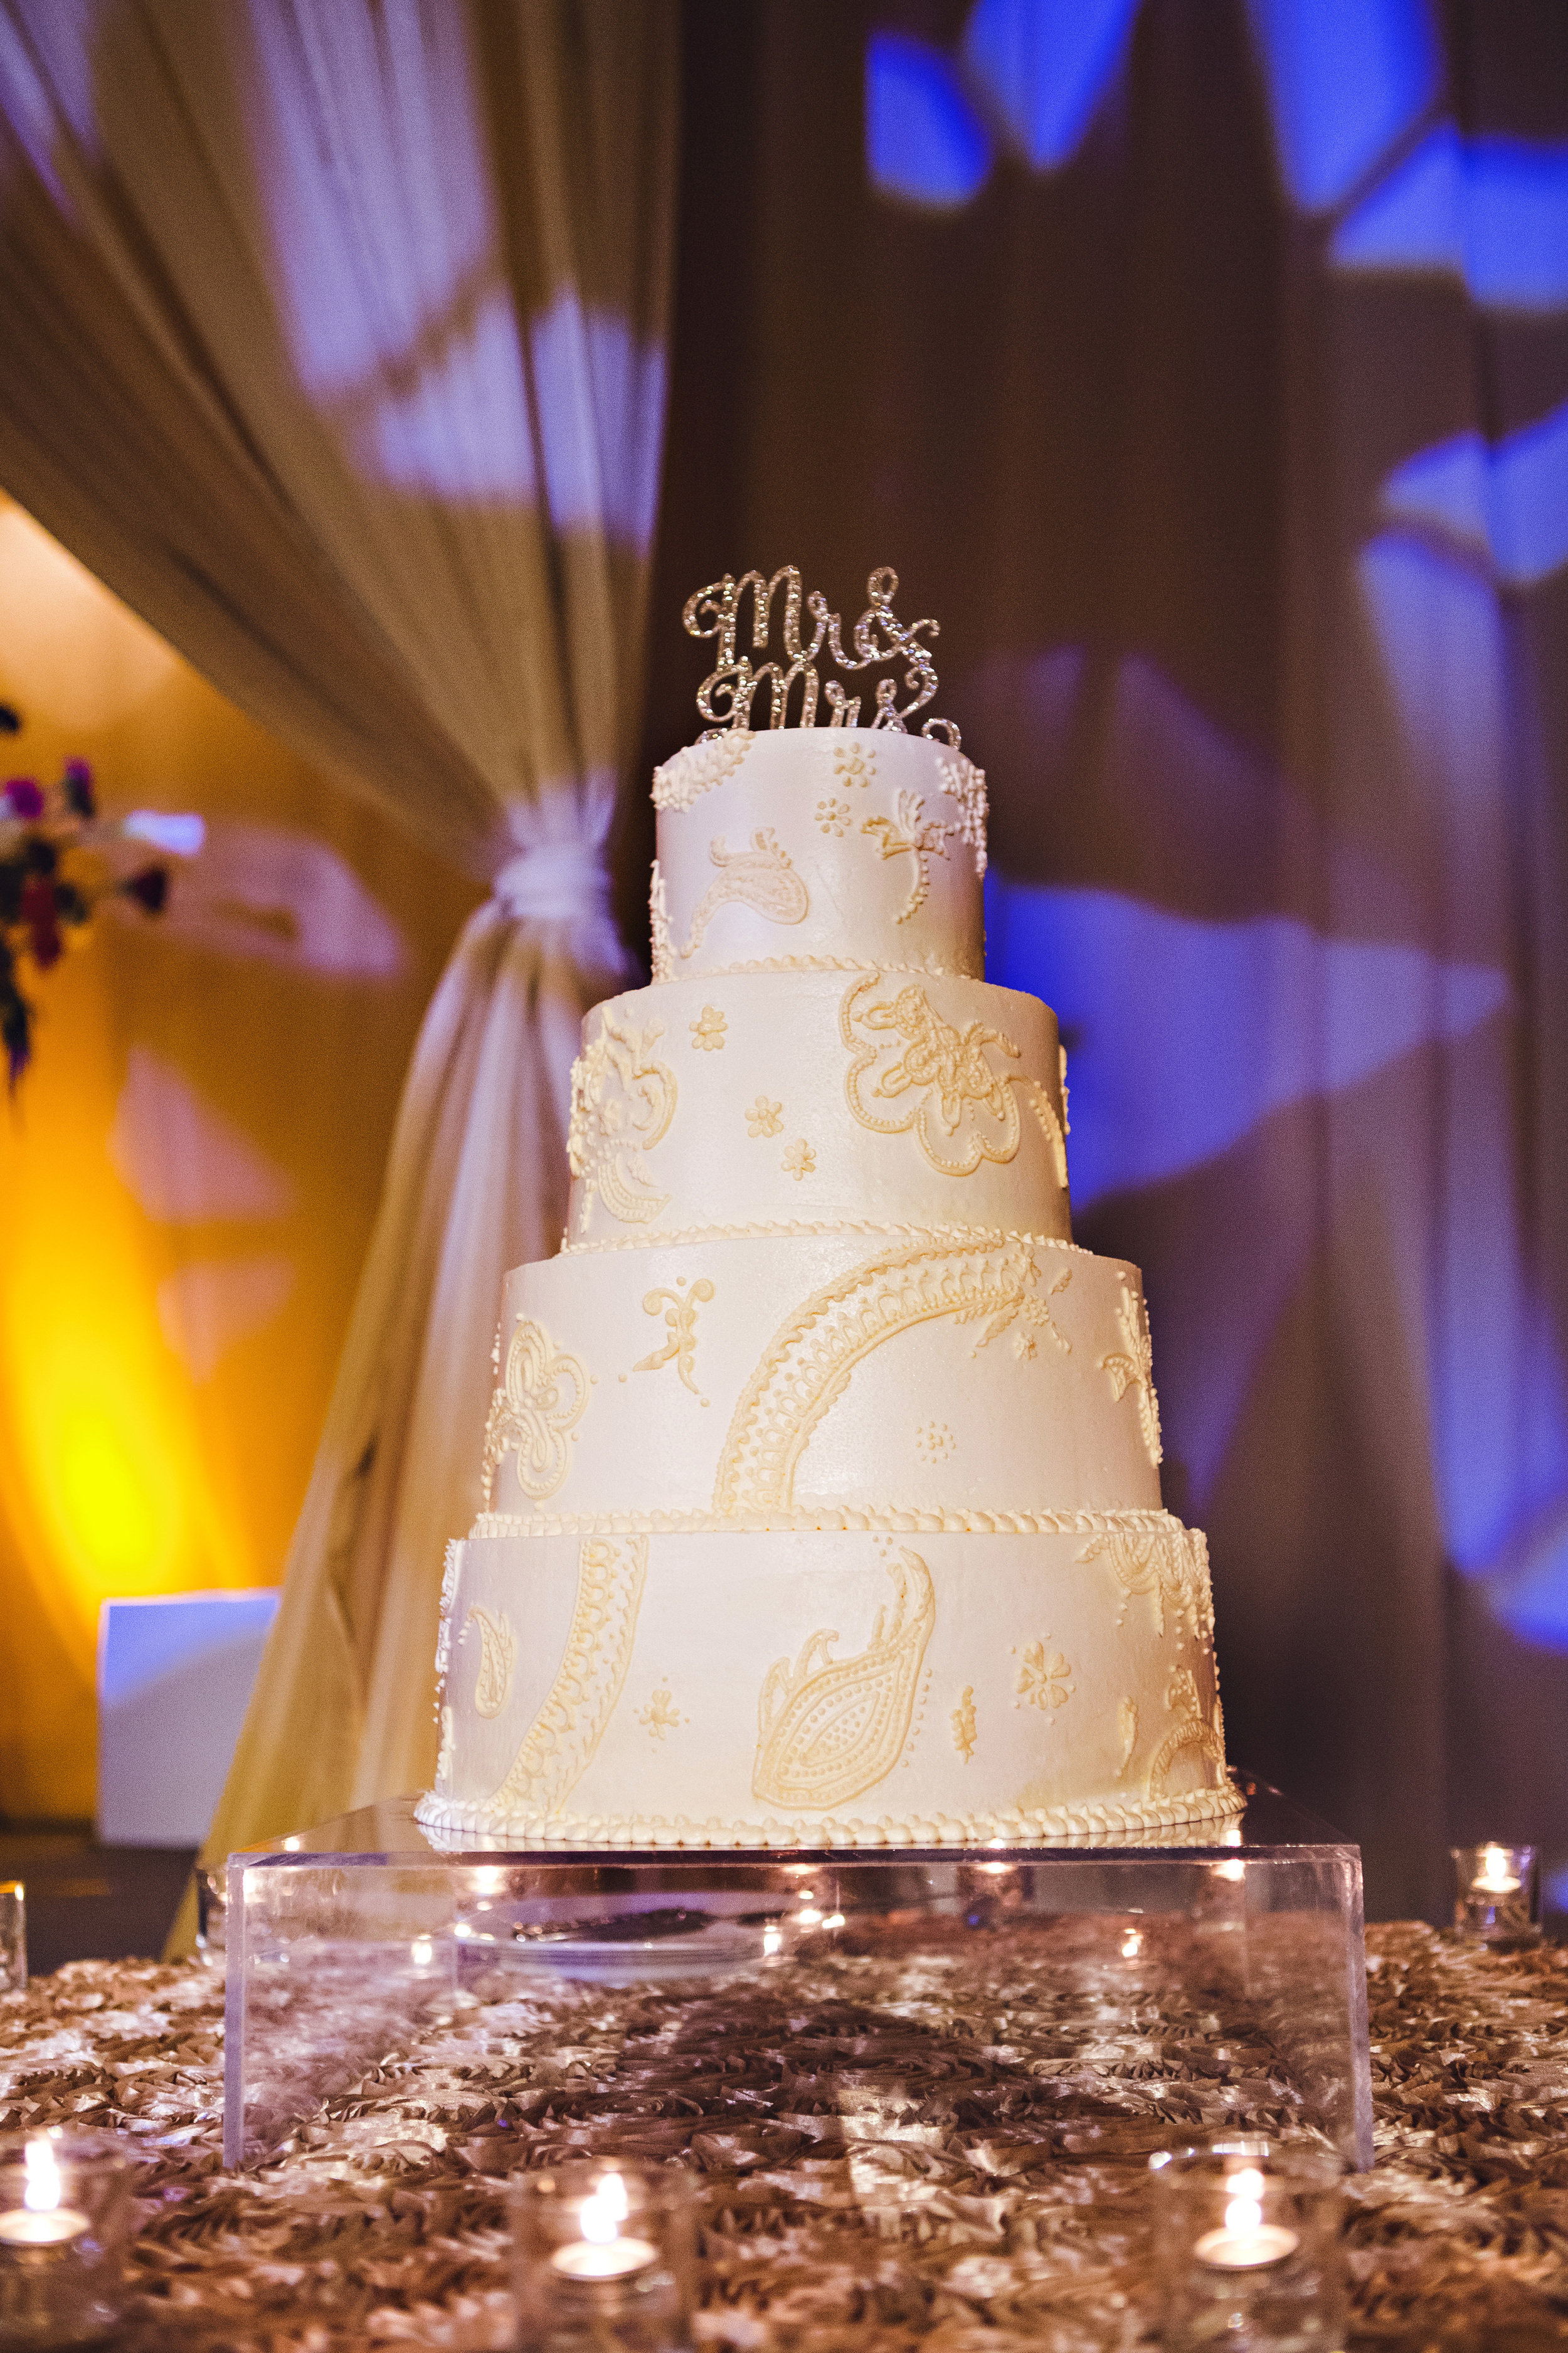 arizona wedding, wedding planner, scottsdale wedding planner, destination wedding planner, phoenix wedding planner, wedding coordinator, event planner, wedding design, wedding cake